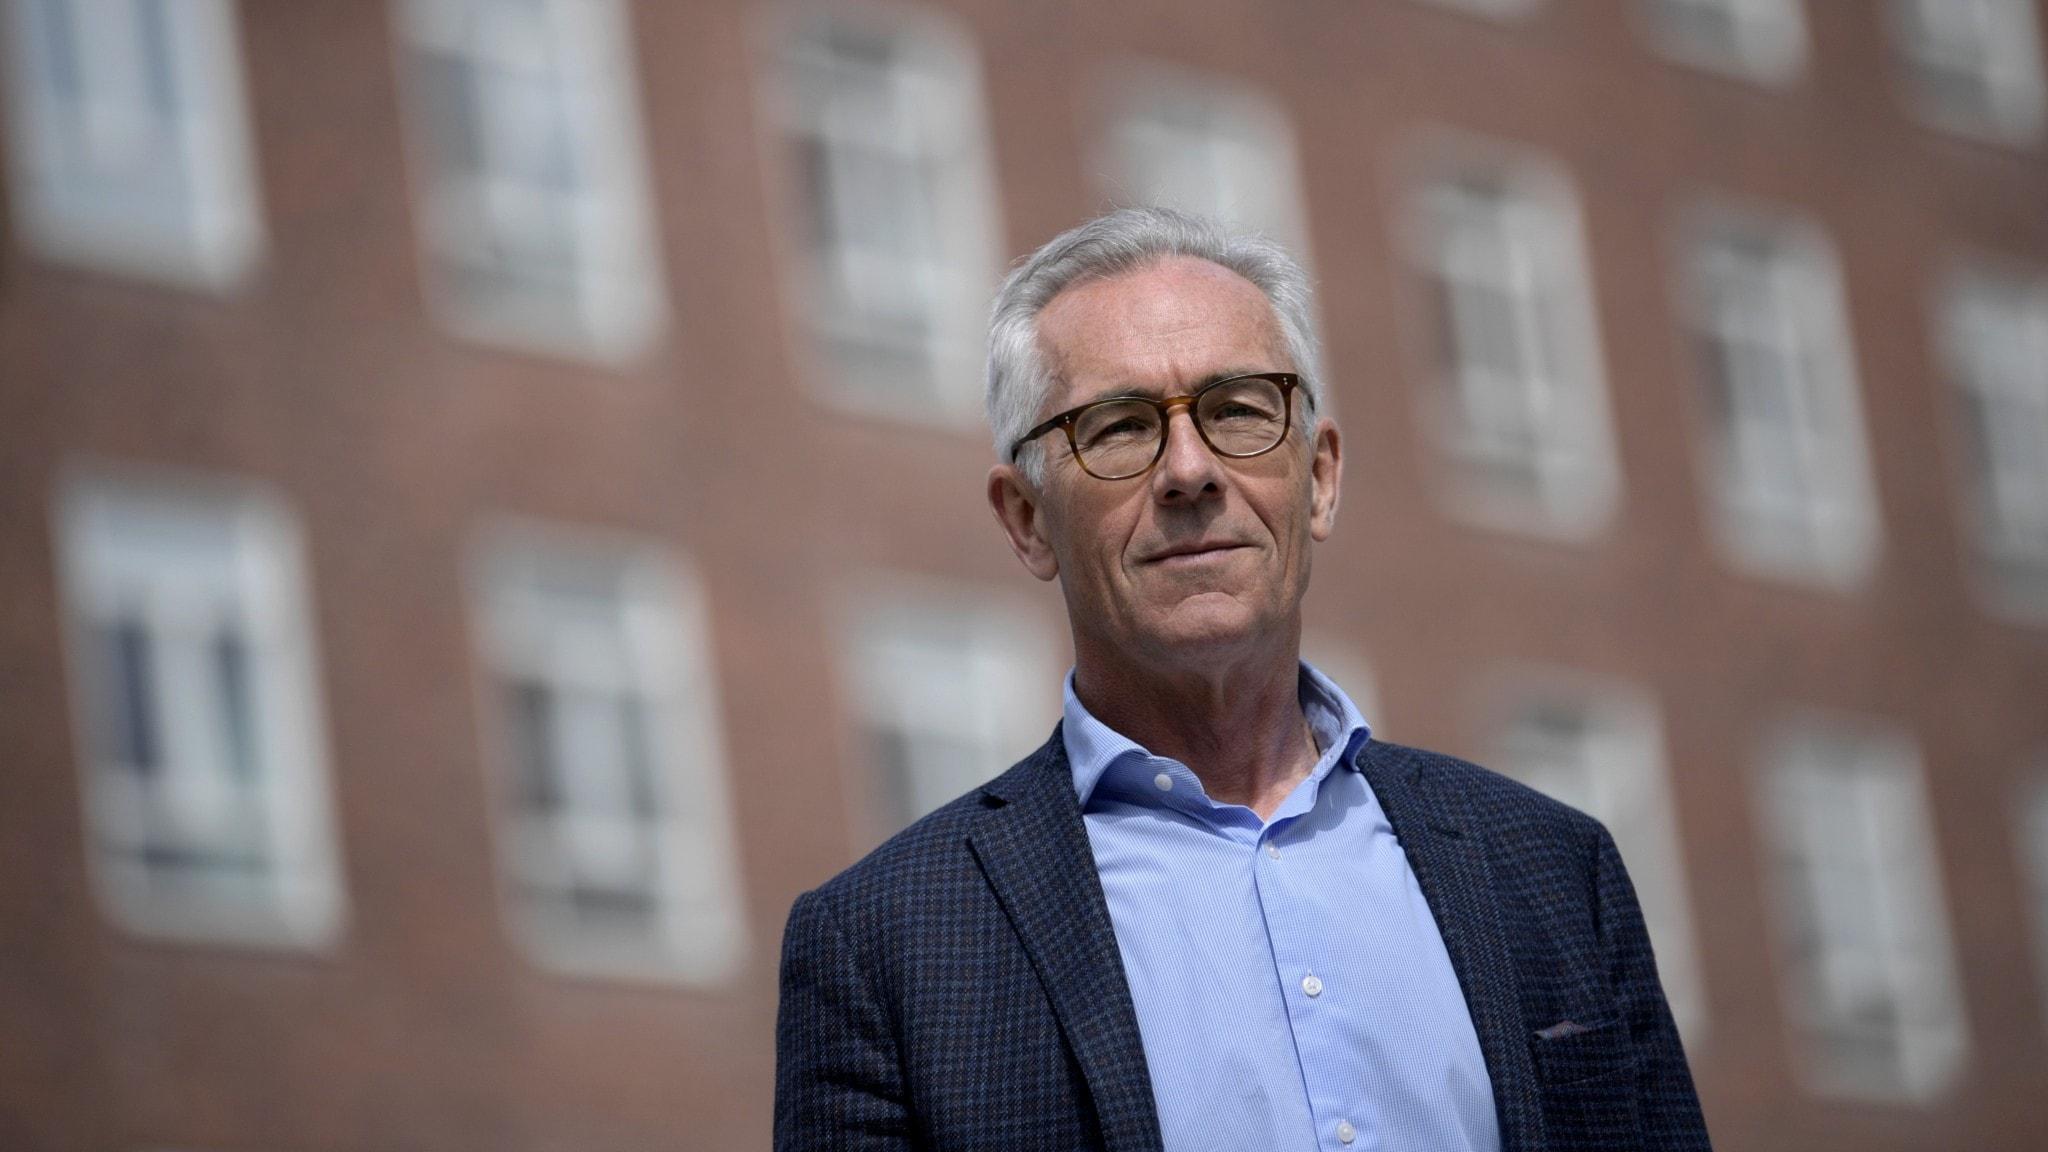 Professor Jan Albert